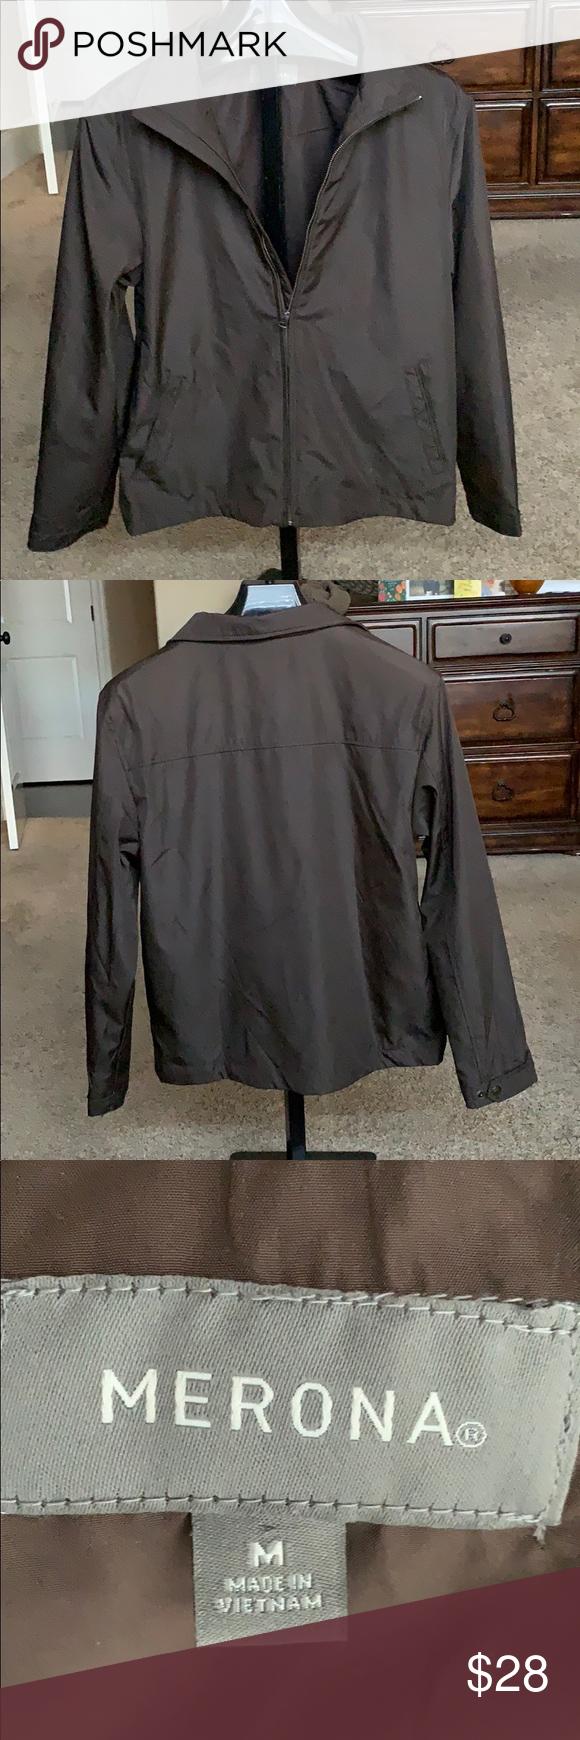 fa6f9bea3 Merona brown jacket Brown jacket by Merona. Excellent condition. Zip ...